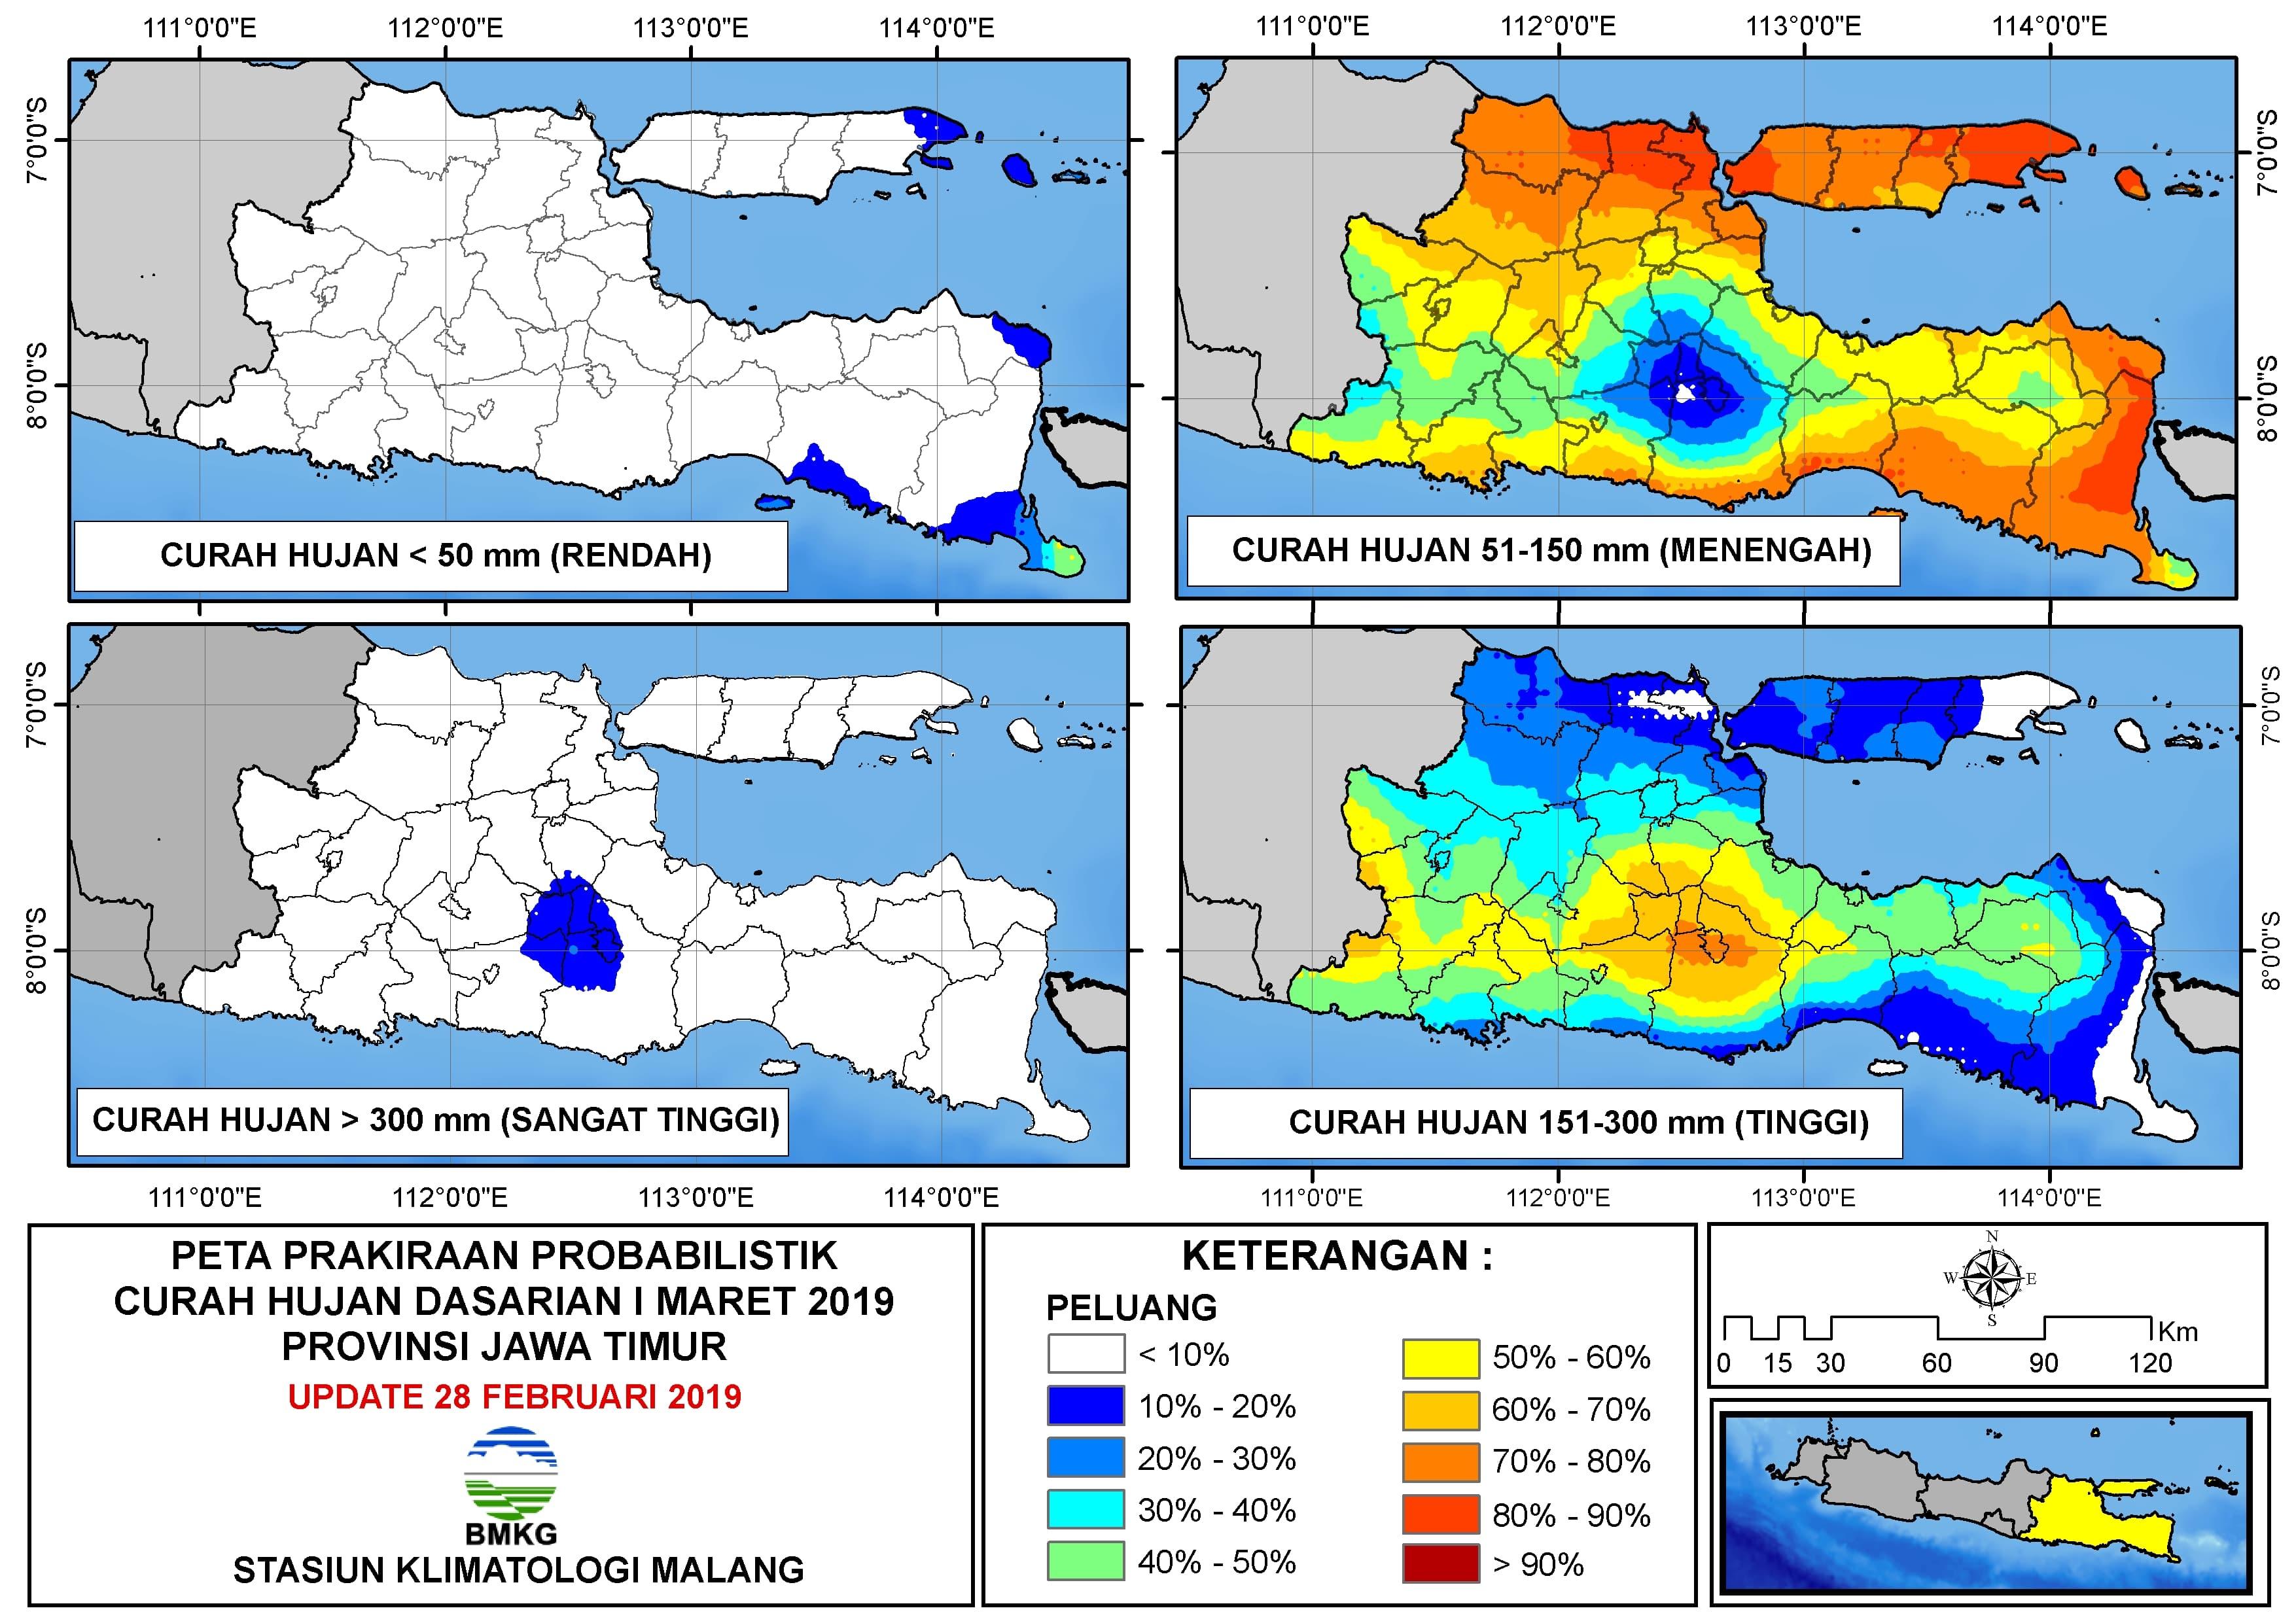 Peta Prakiraan Probabilistik Curah Hujan Dasarian Provinsi Jawa Timur Update 28 Februari 2019